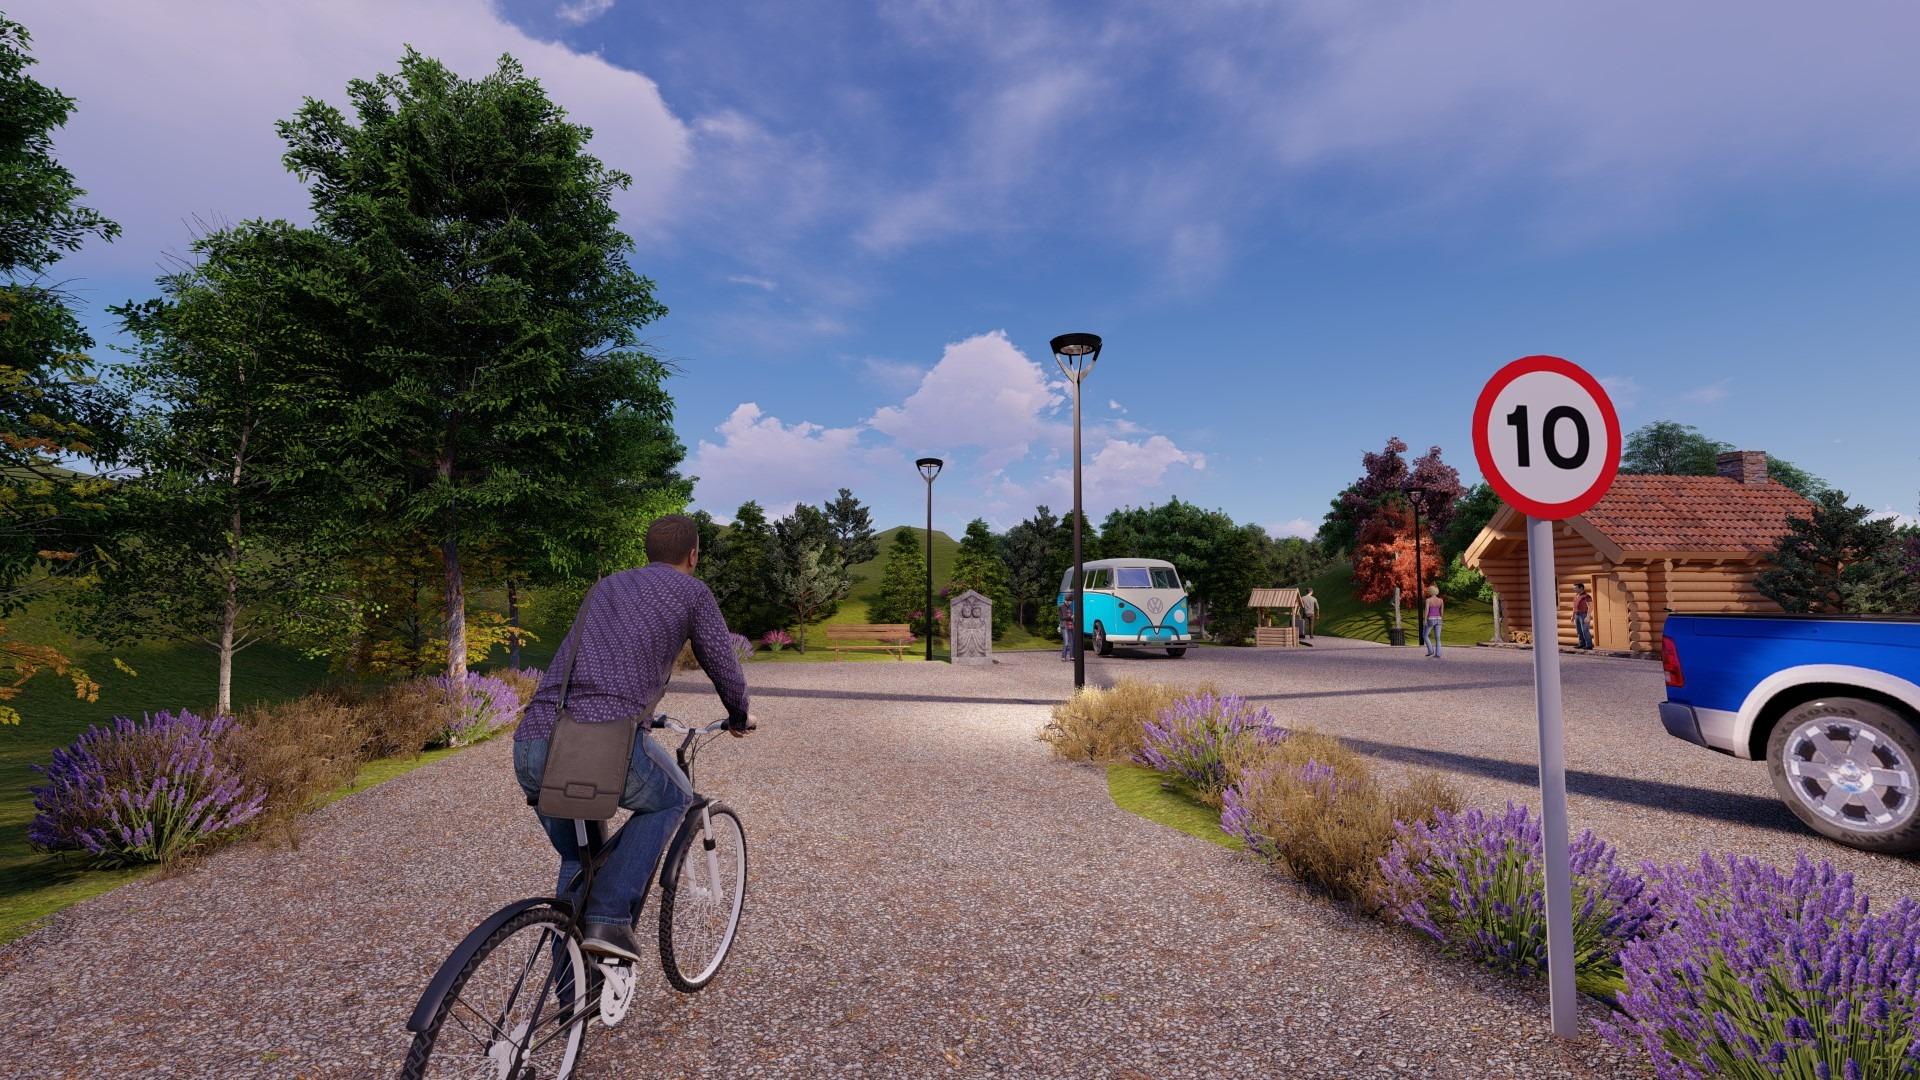 Artfulparks Enterance, Car Park and Reception